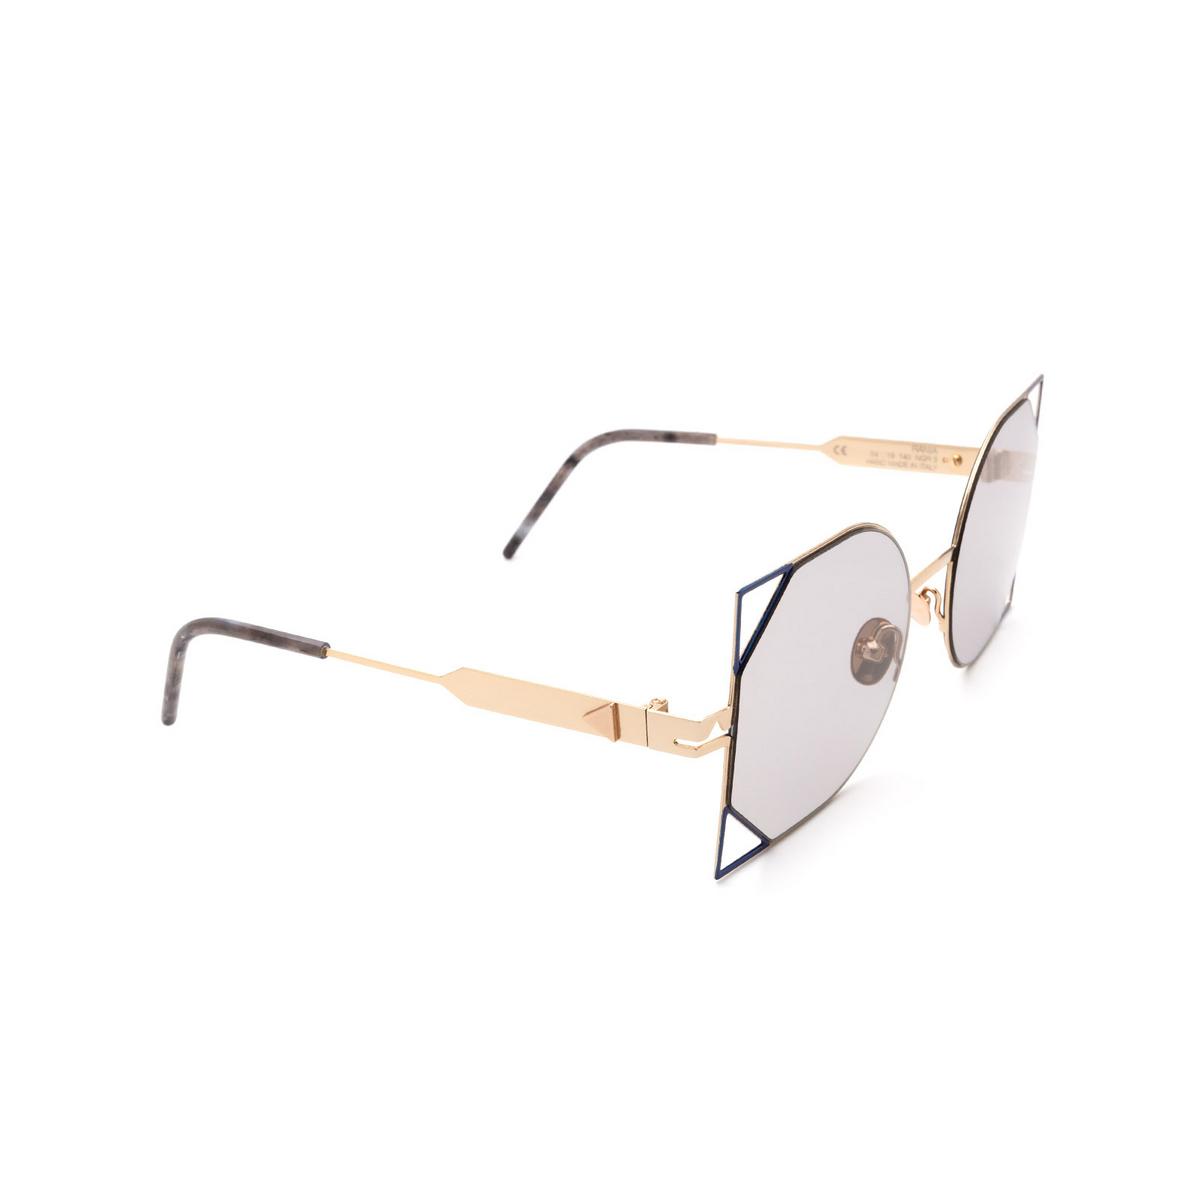 Soya® Irregular Sunglasses: Rania color Shiny Gold Rose & Shiny Navy Ngr-lg.